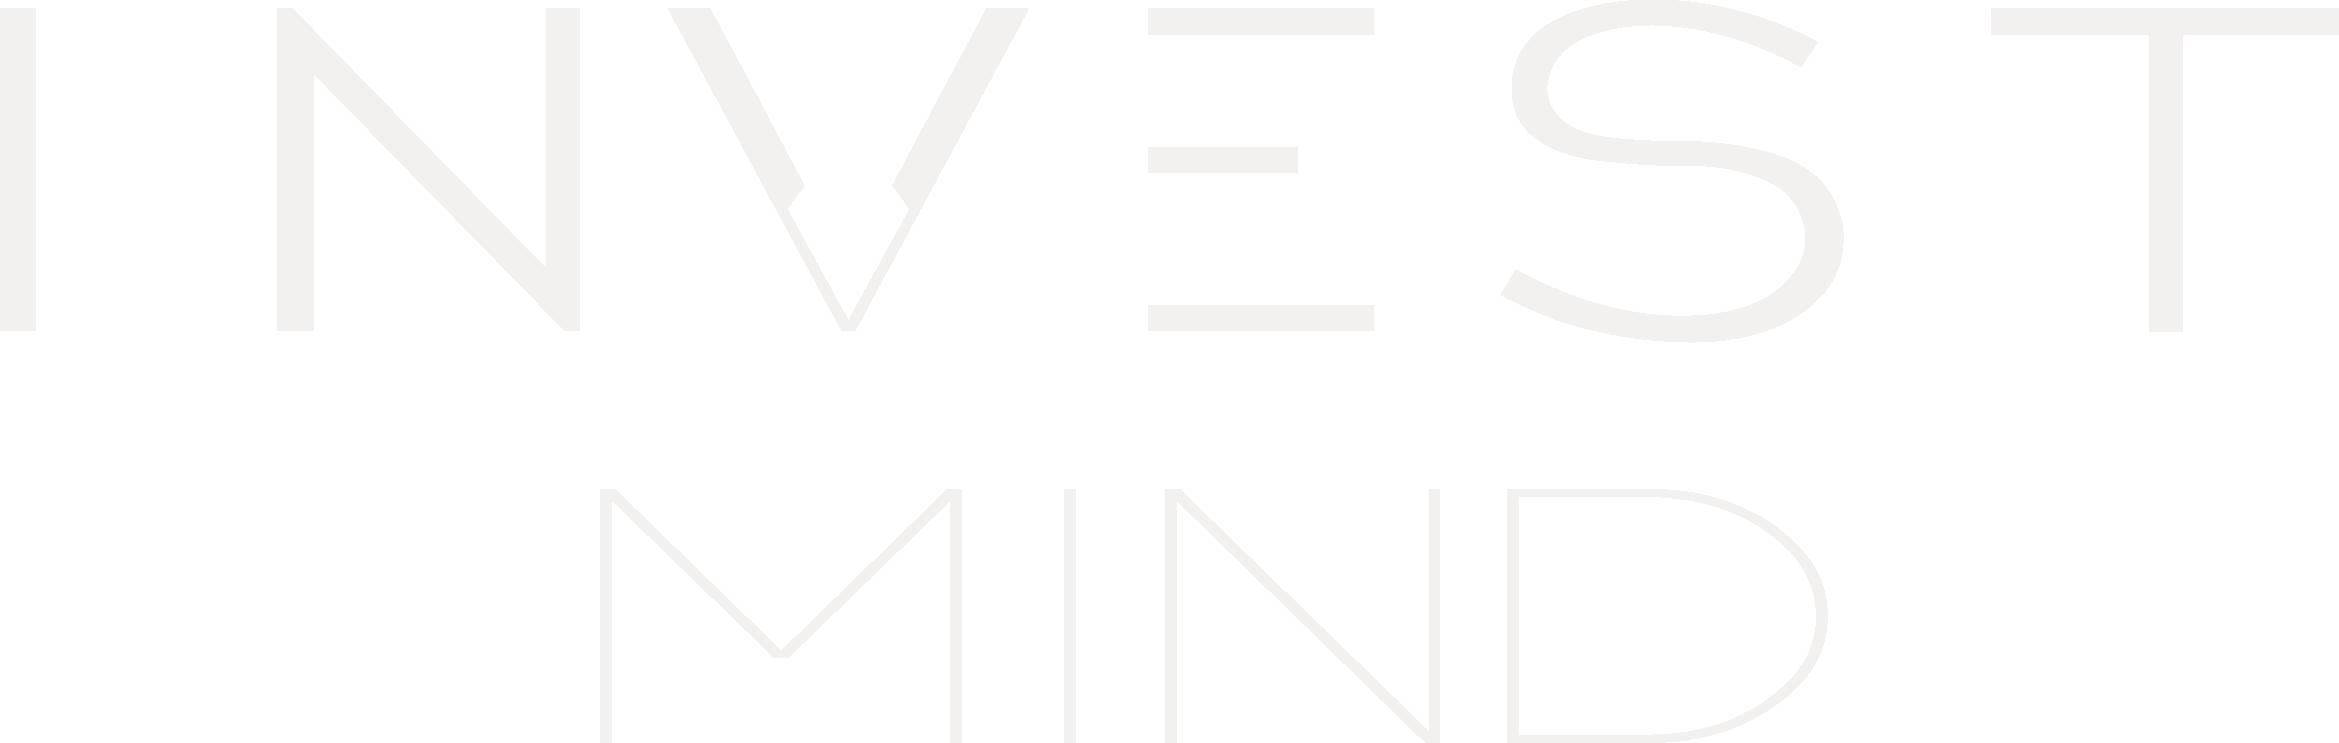 INVEST MIND